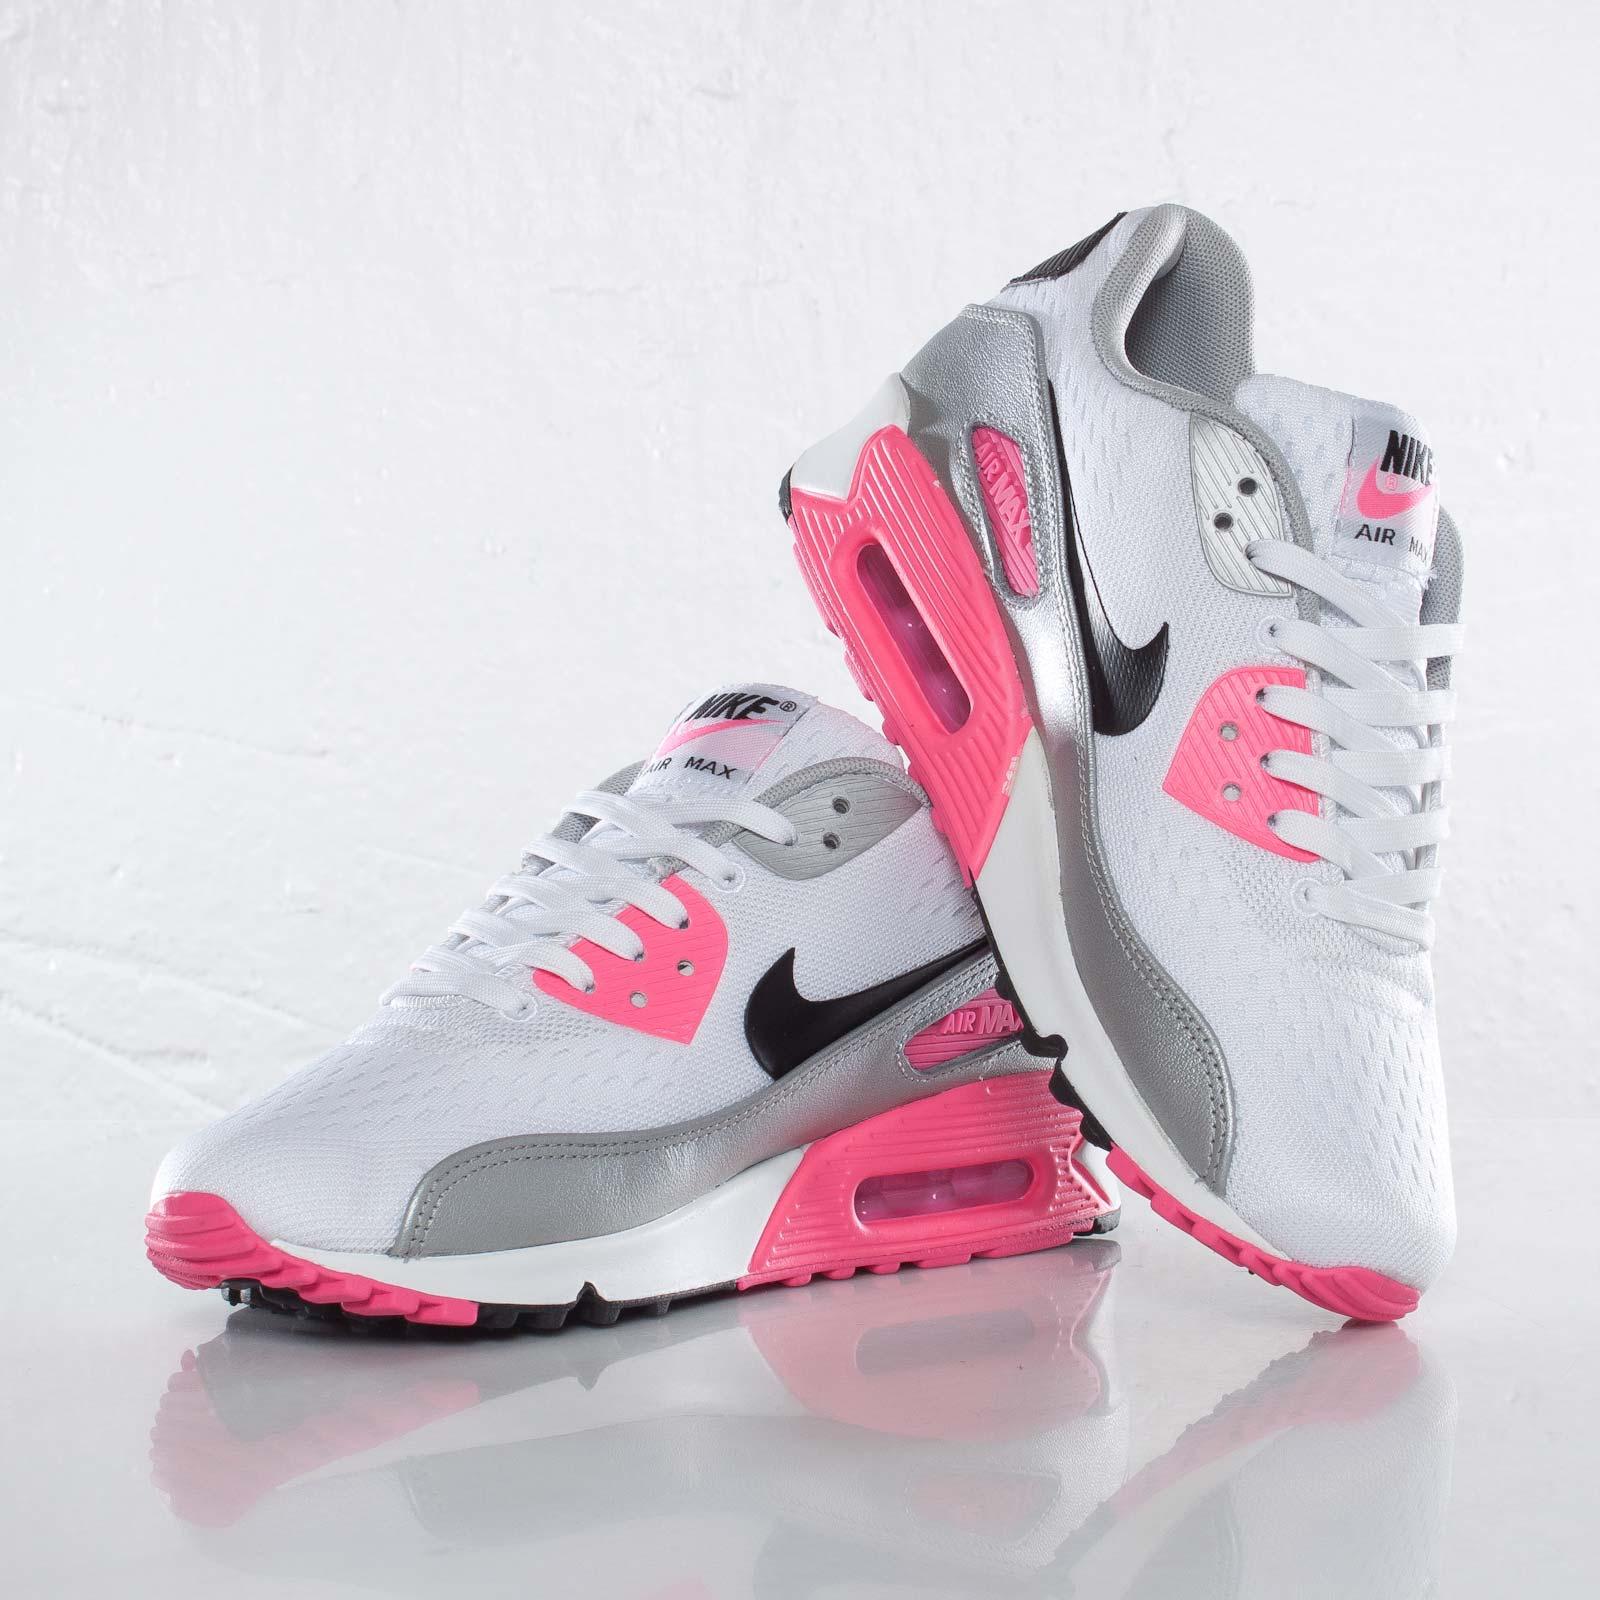 finest selection eb87c d144b Nike Wmns Air Max 90 EM - 553564-160 - Sneakersnstuff   sneakers    streetwear online since 1999